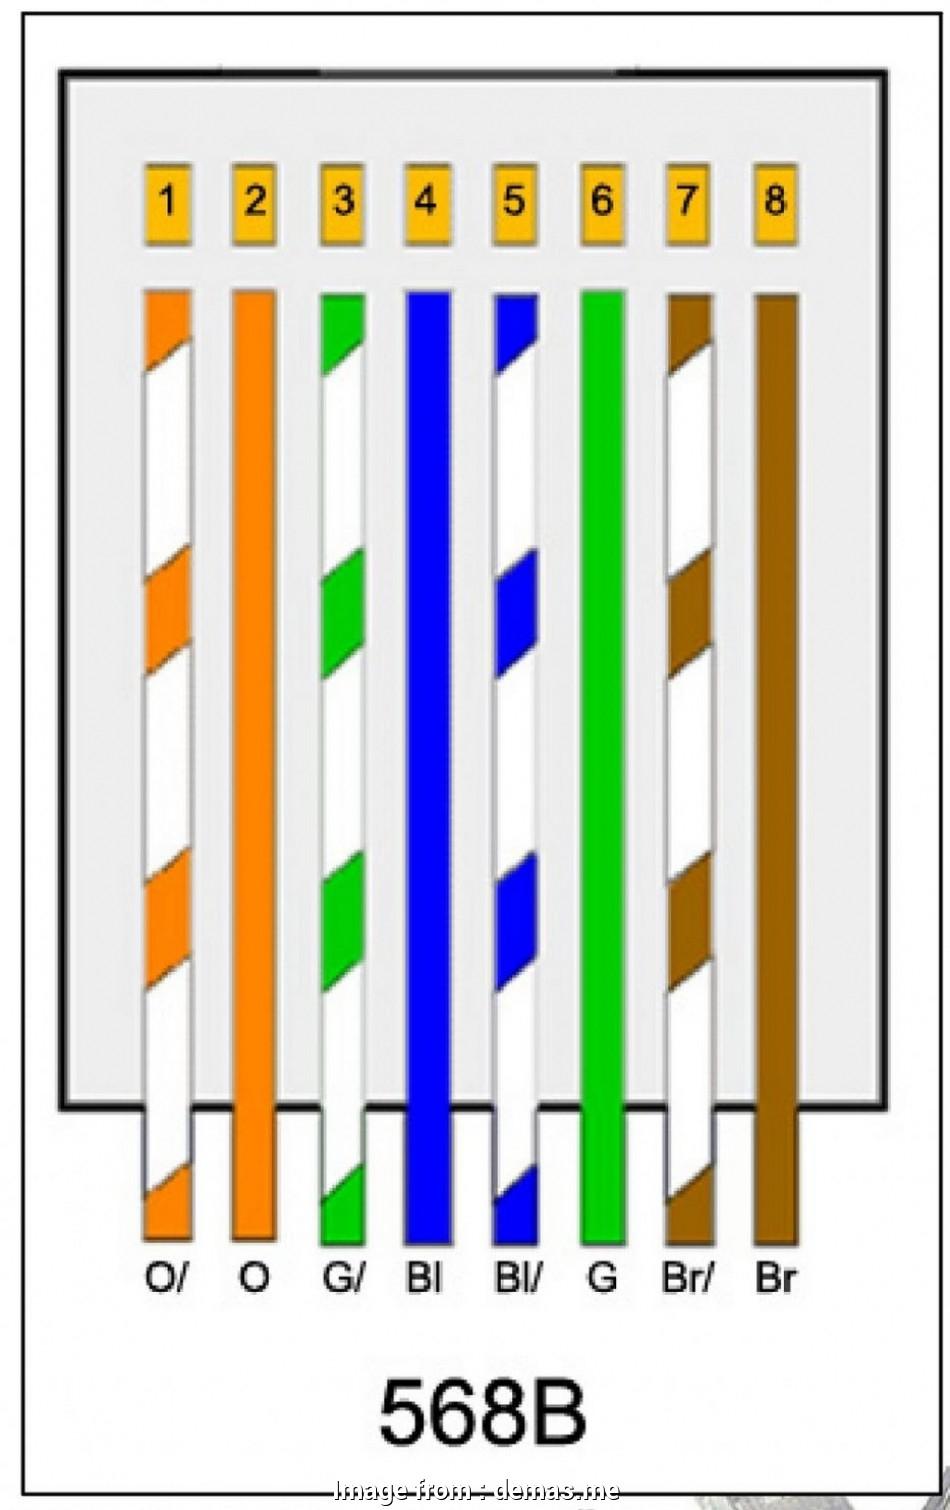 Cat 6 Wiring Diagrams 568A Vs 568B - Seniorsclub.it